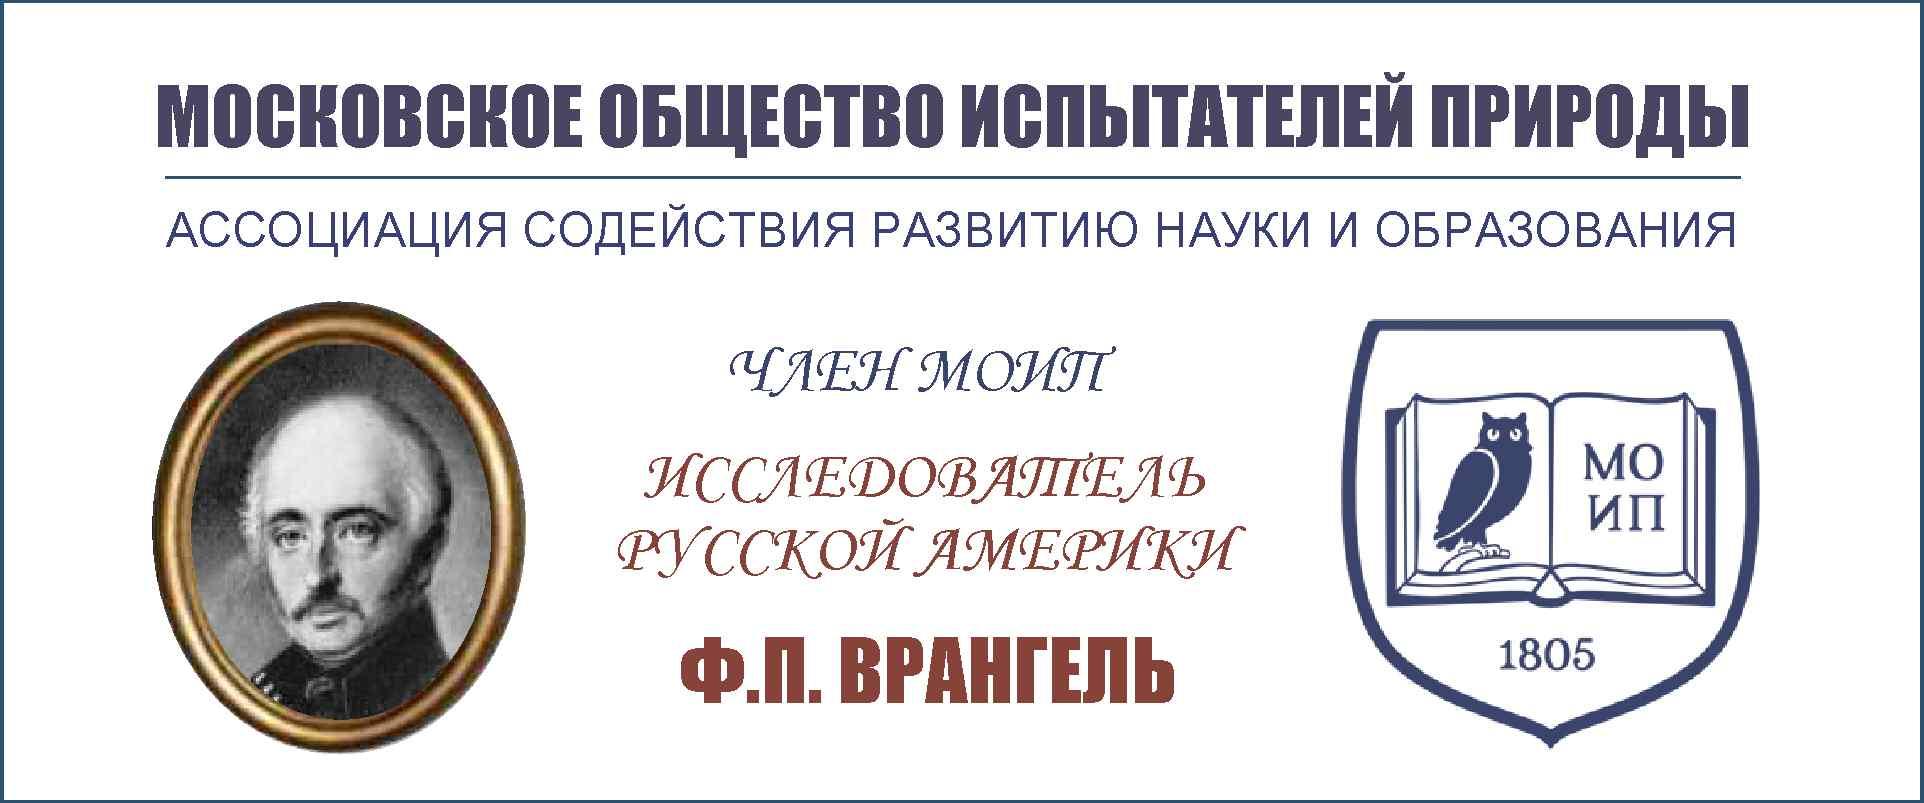 АДМИРАЛ ВРАНГЕЛЬ Ф.П. – ЧЛЕН МОИП